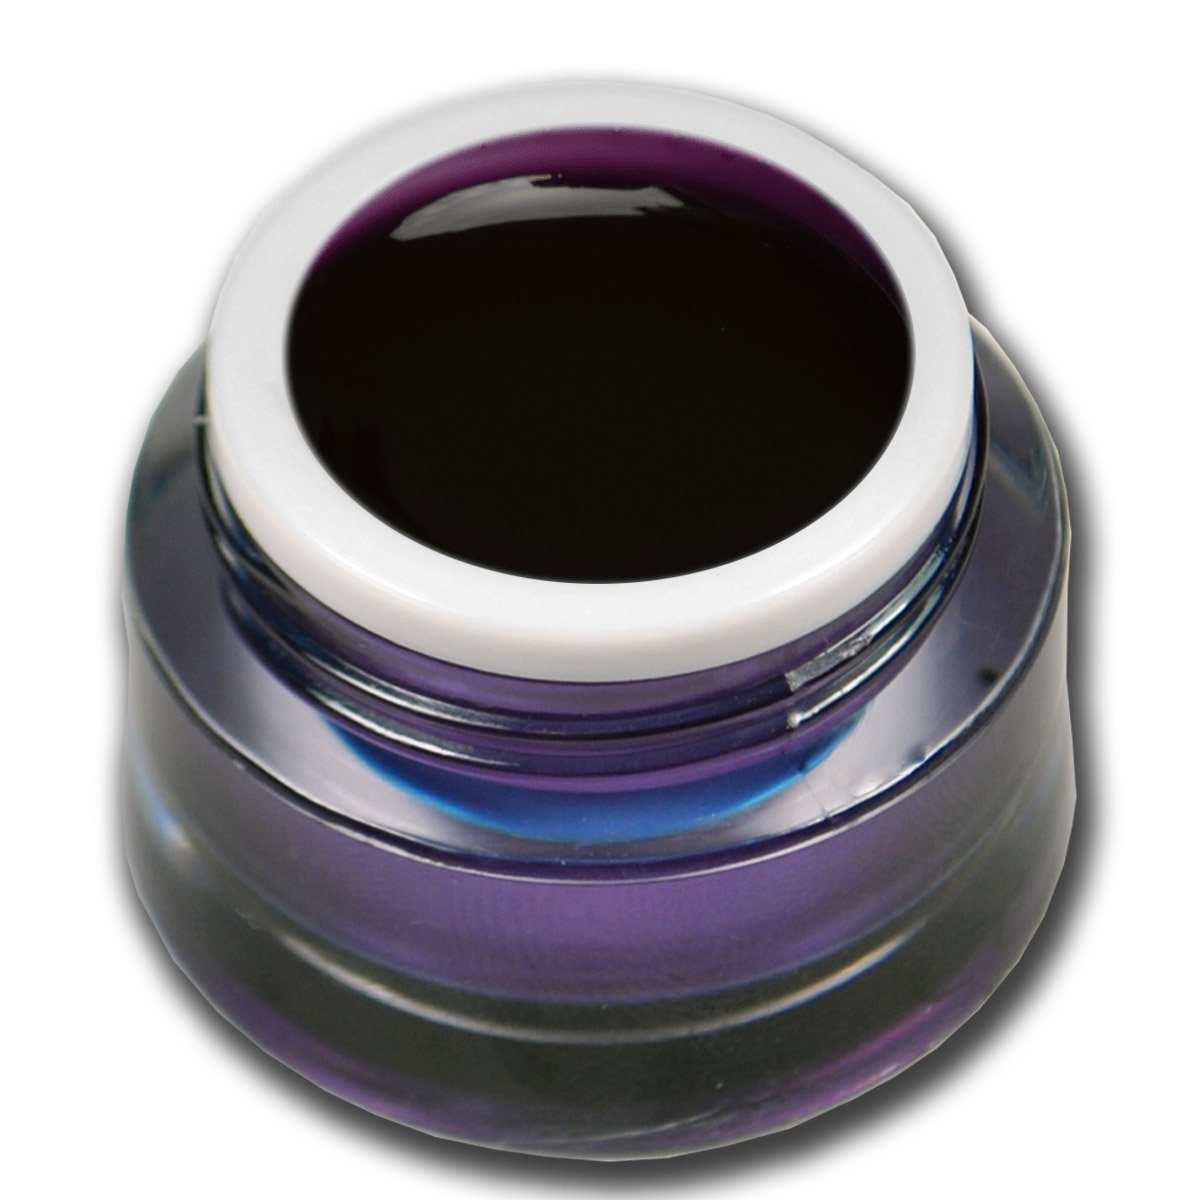 RM Beautynails–Premium Gel vetro colorato 5ml Gel UV Unghie Nail Art